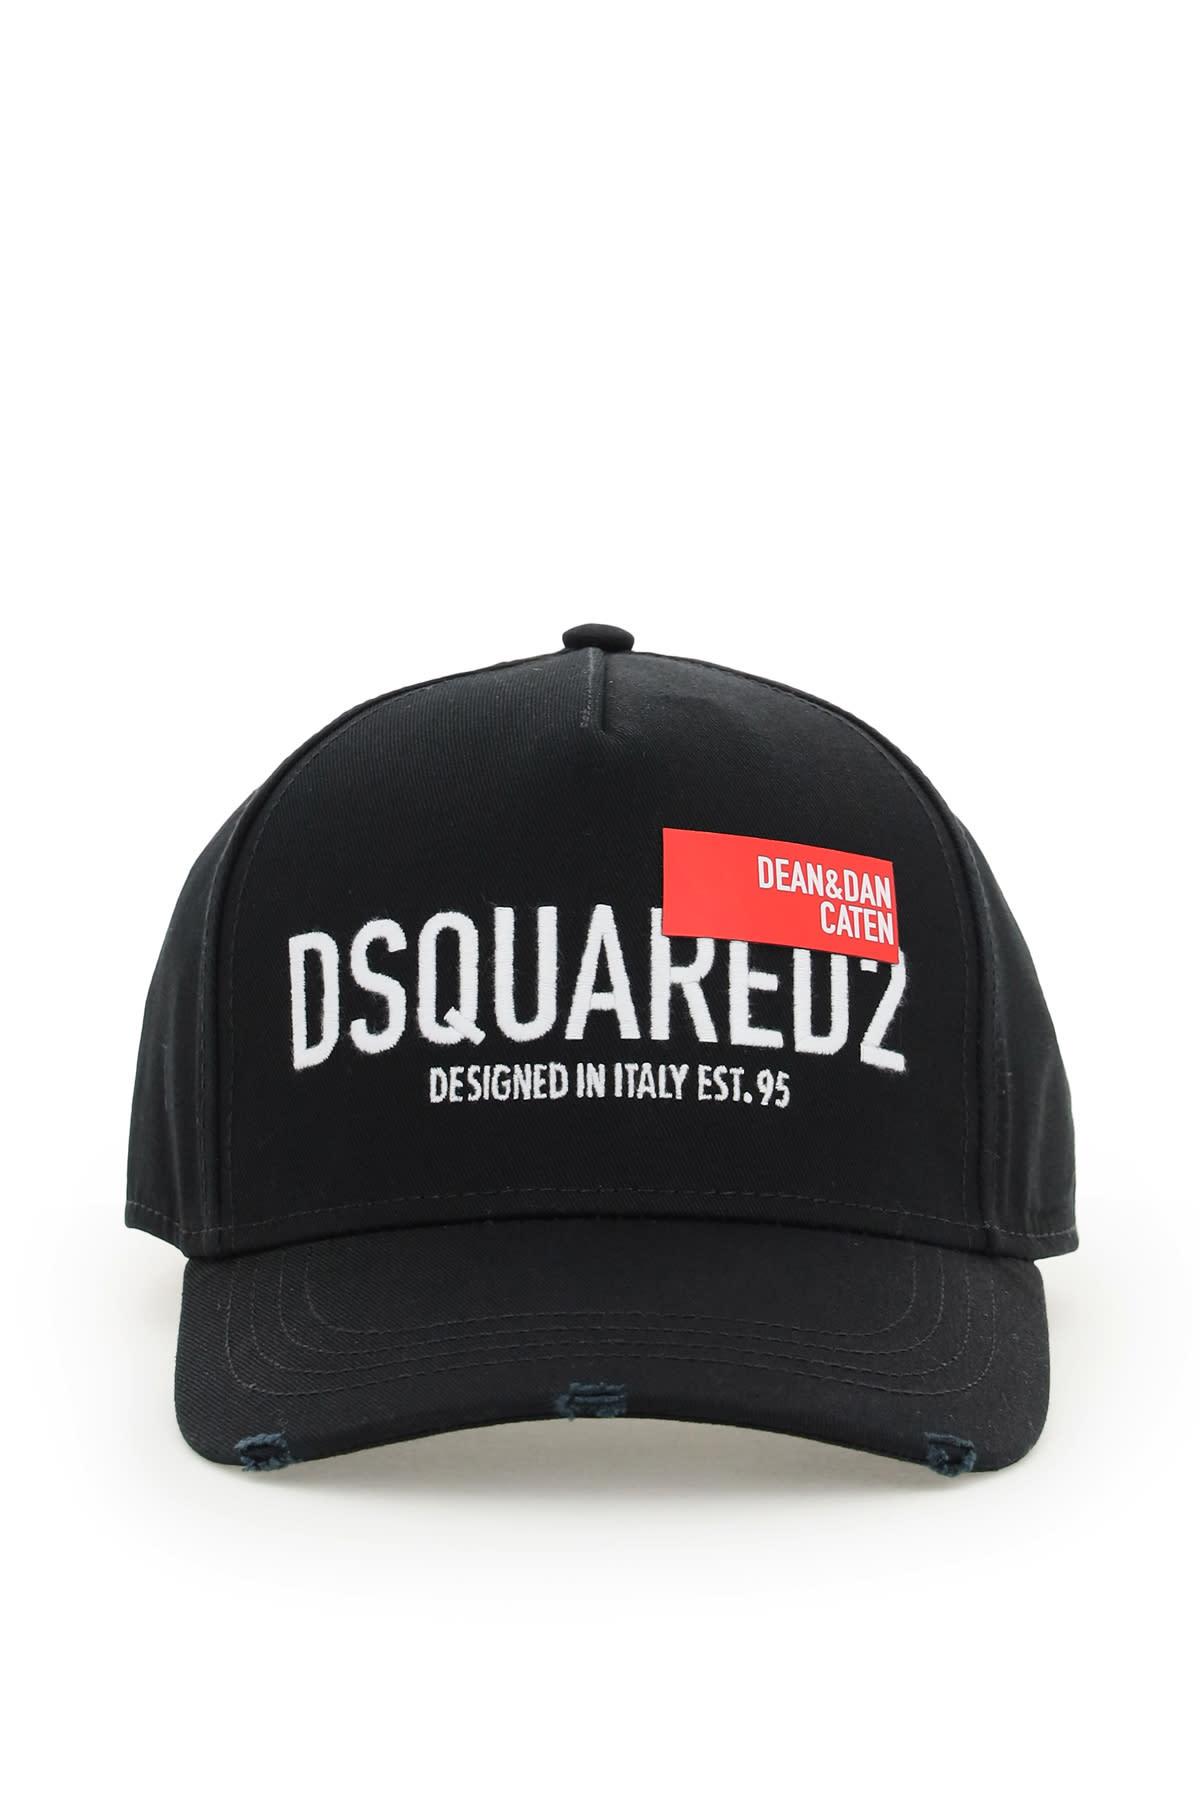 Dsquared2 D & d Red Tag Baseball Cap